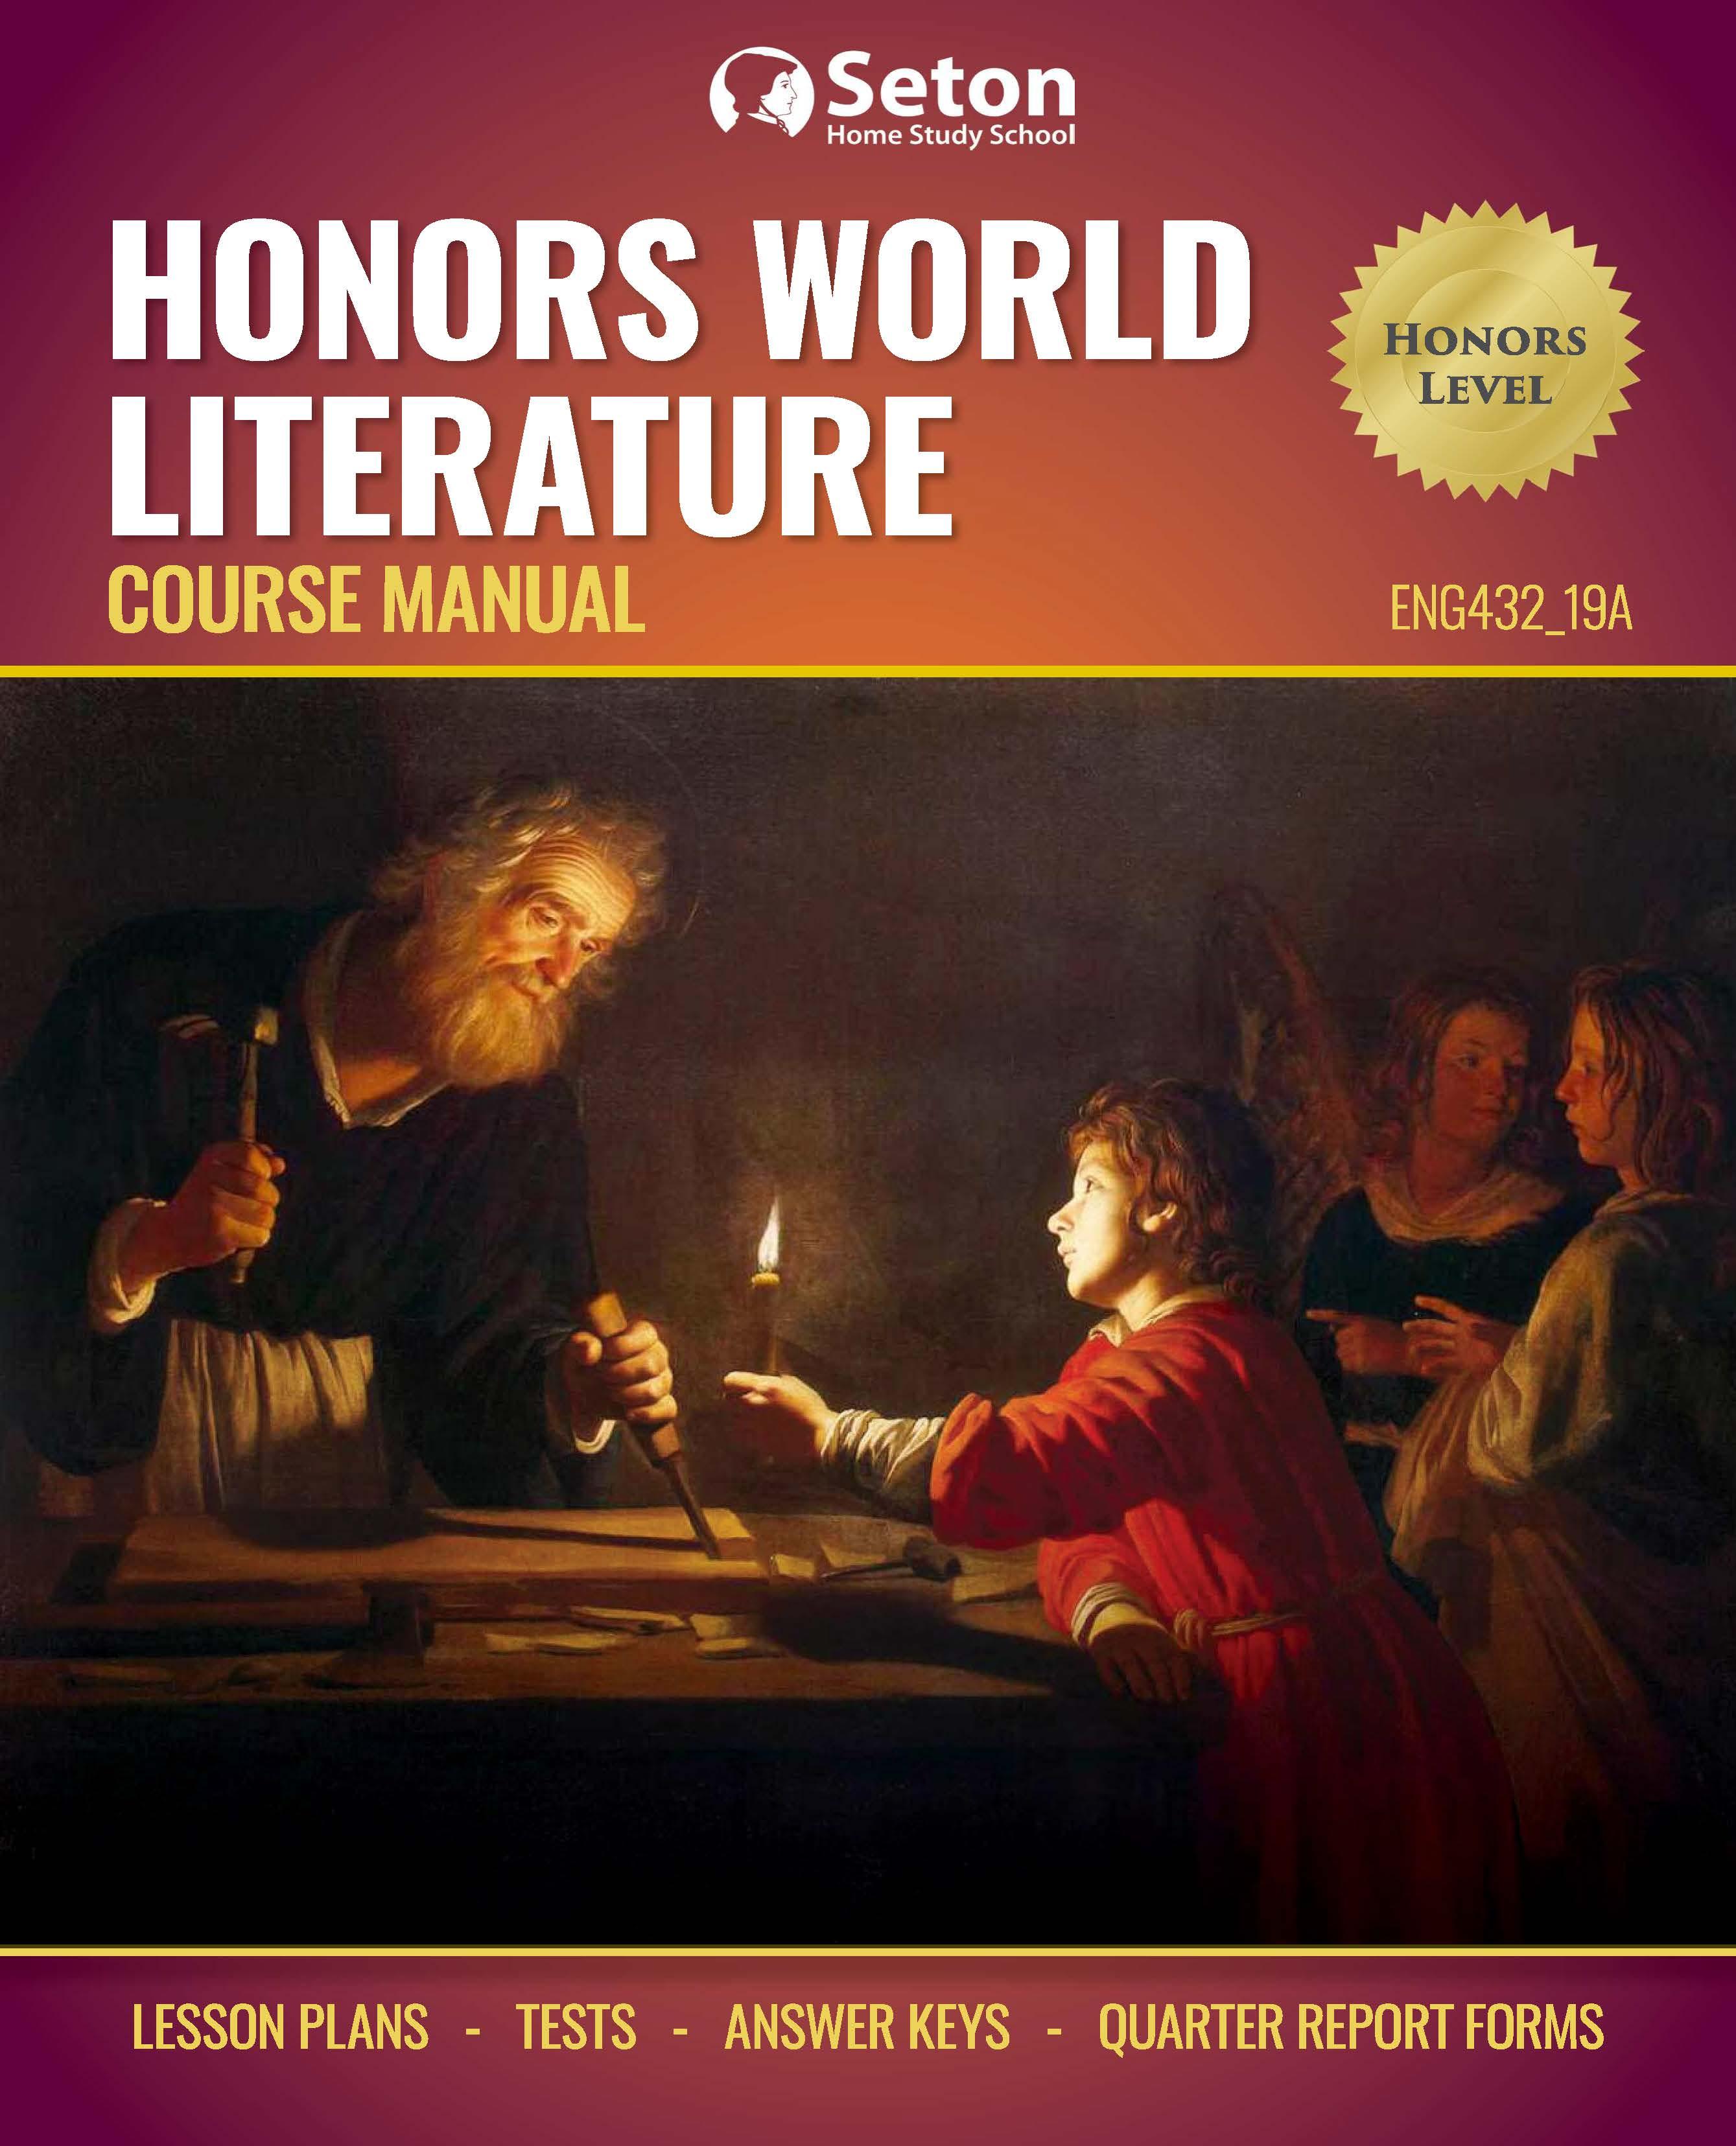 Honors World Literature - Seton Home Study School